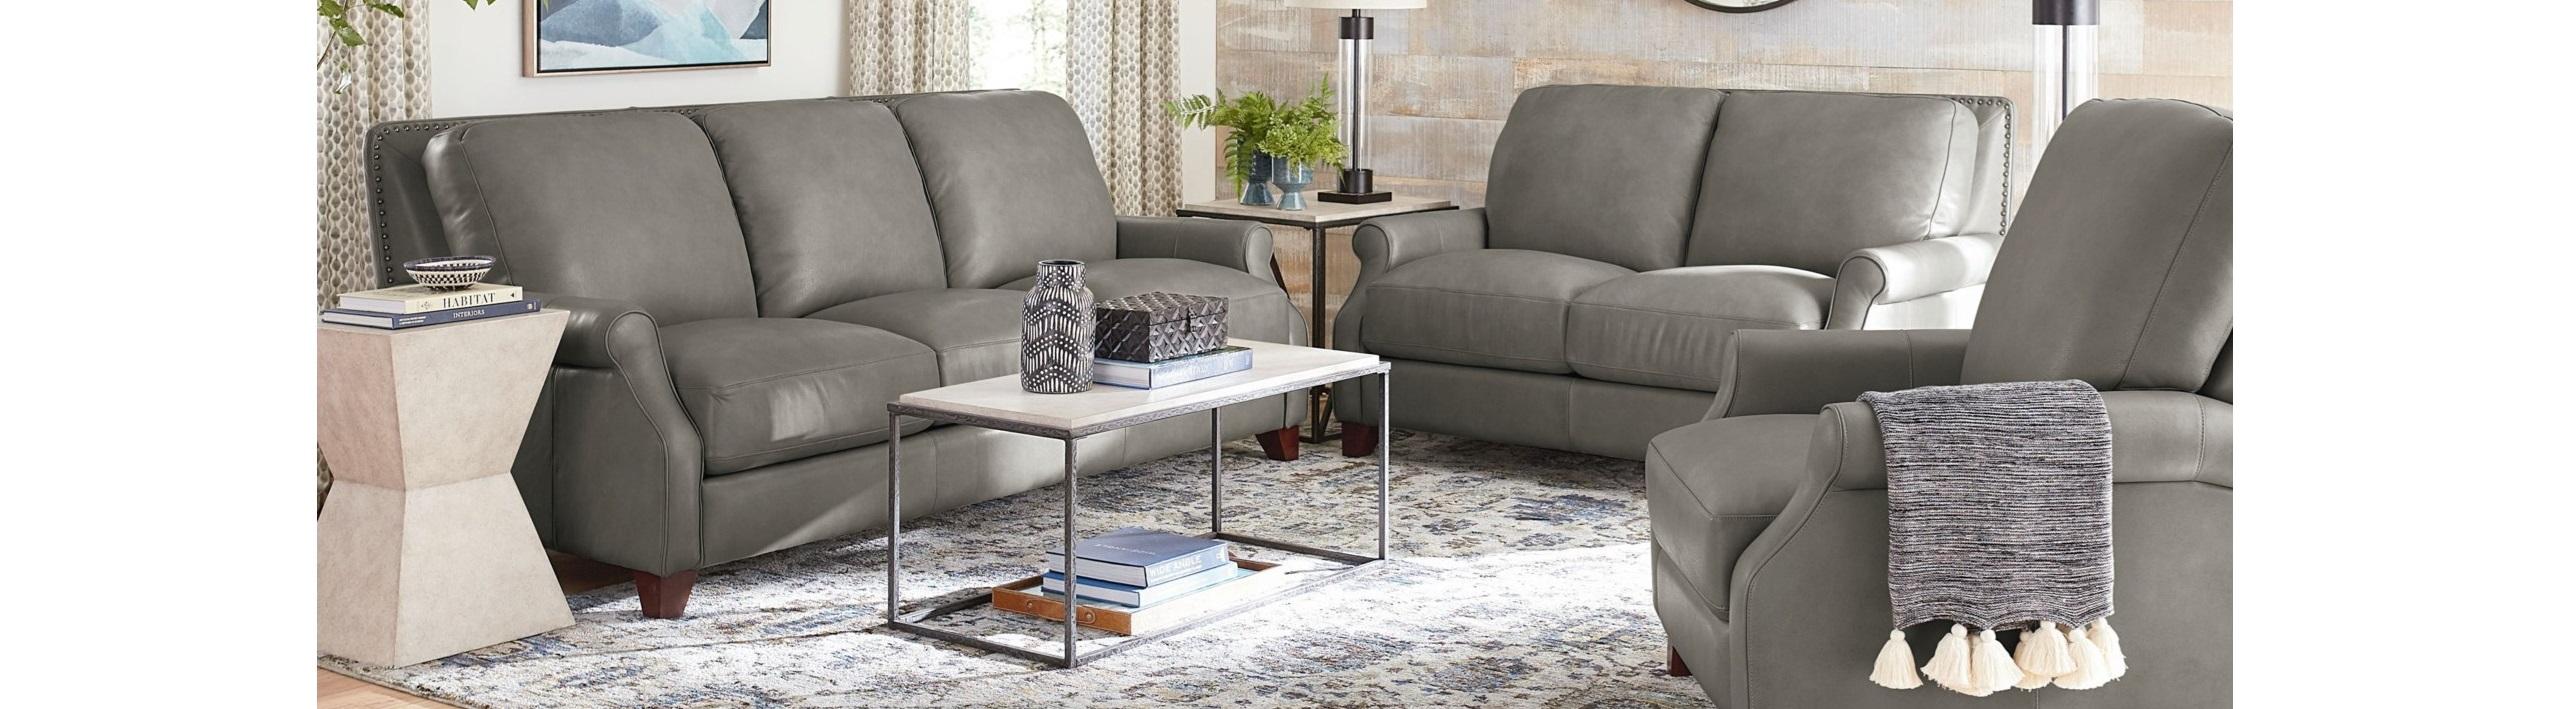 Crowley Furniture & Mattress reviews | Accessories at 200 N 291 Highway - Liberty MO